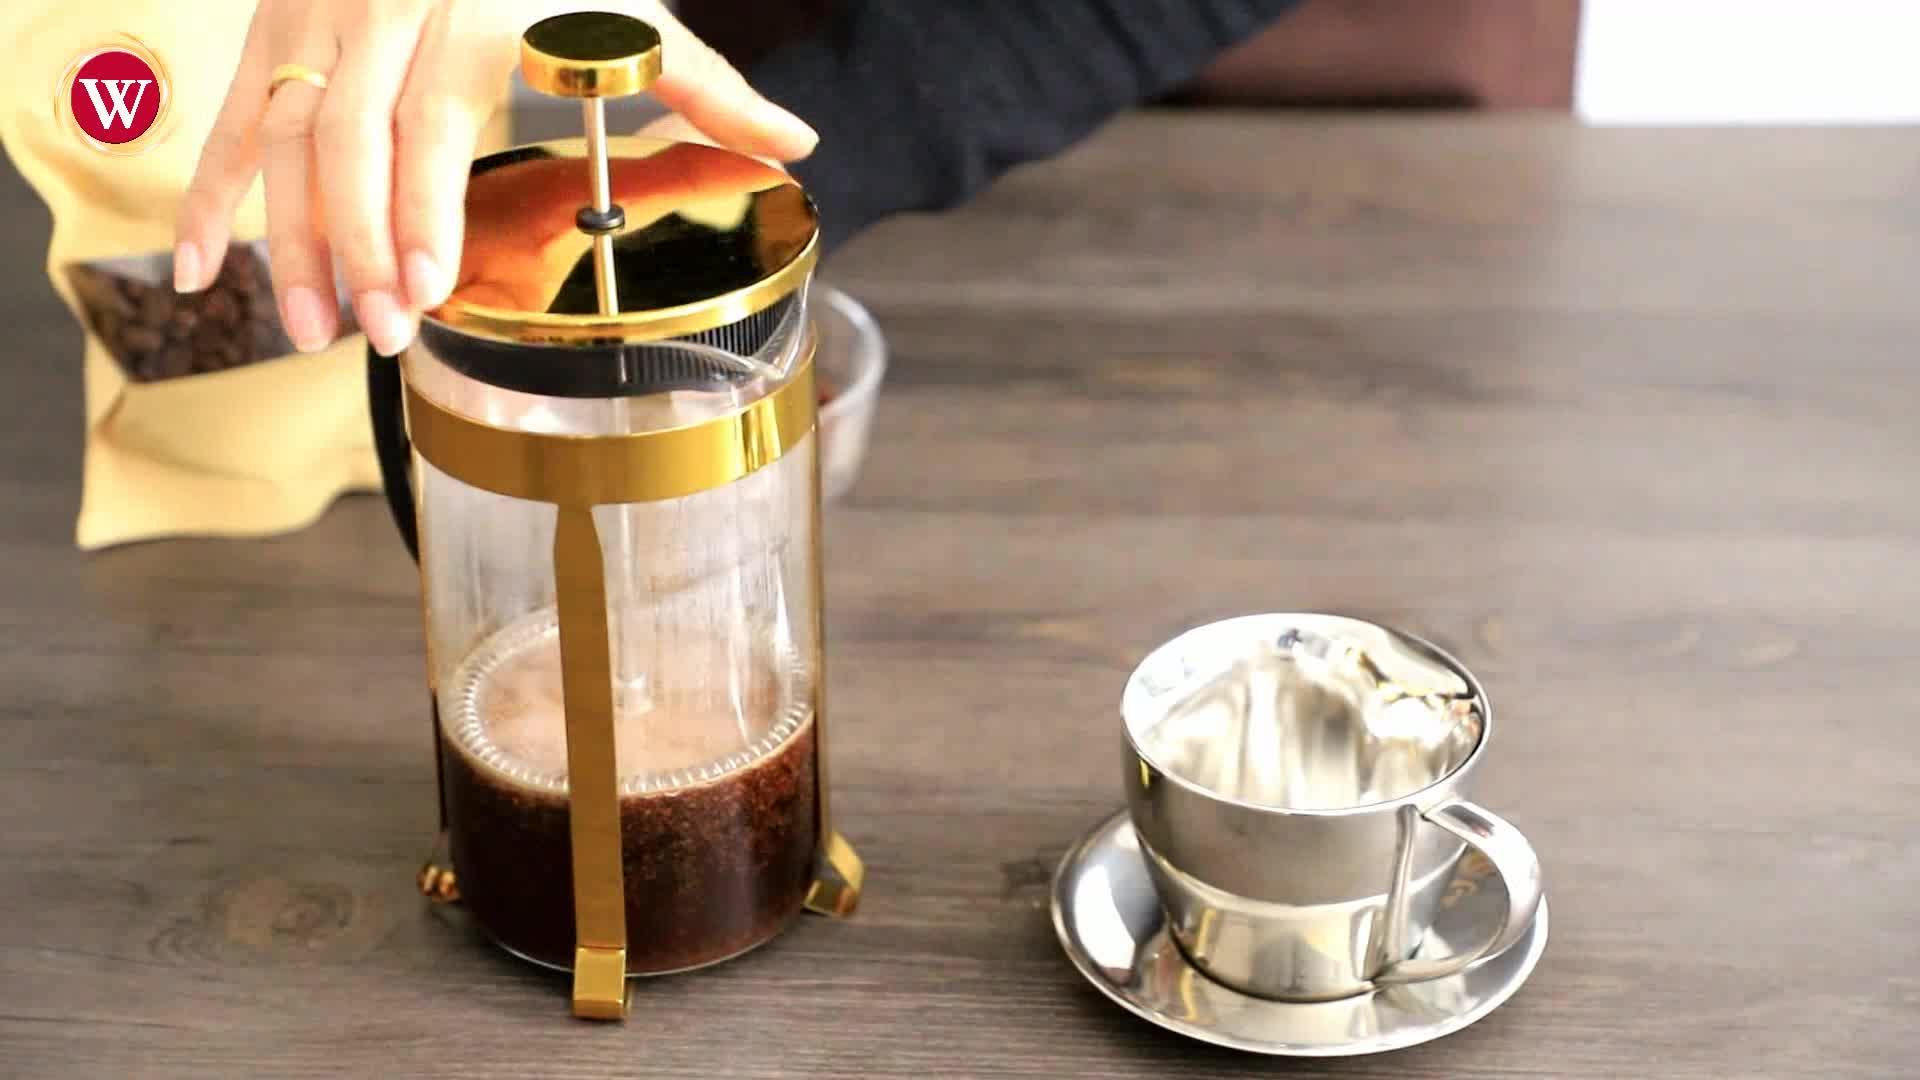 1.0 L / 34 OZ Golden Stainless Steel Heat Resistant Coffee Pot Tea maker